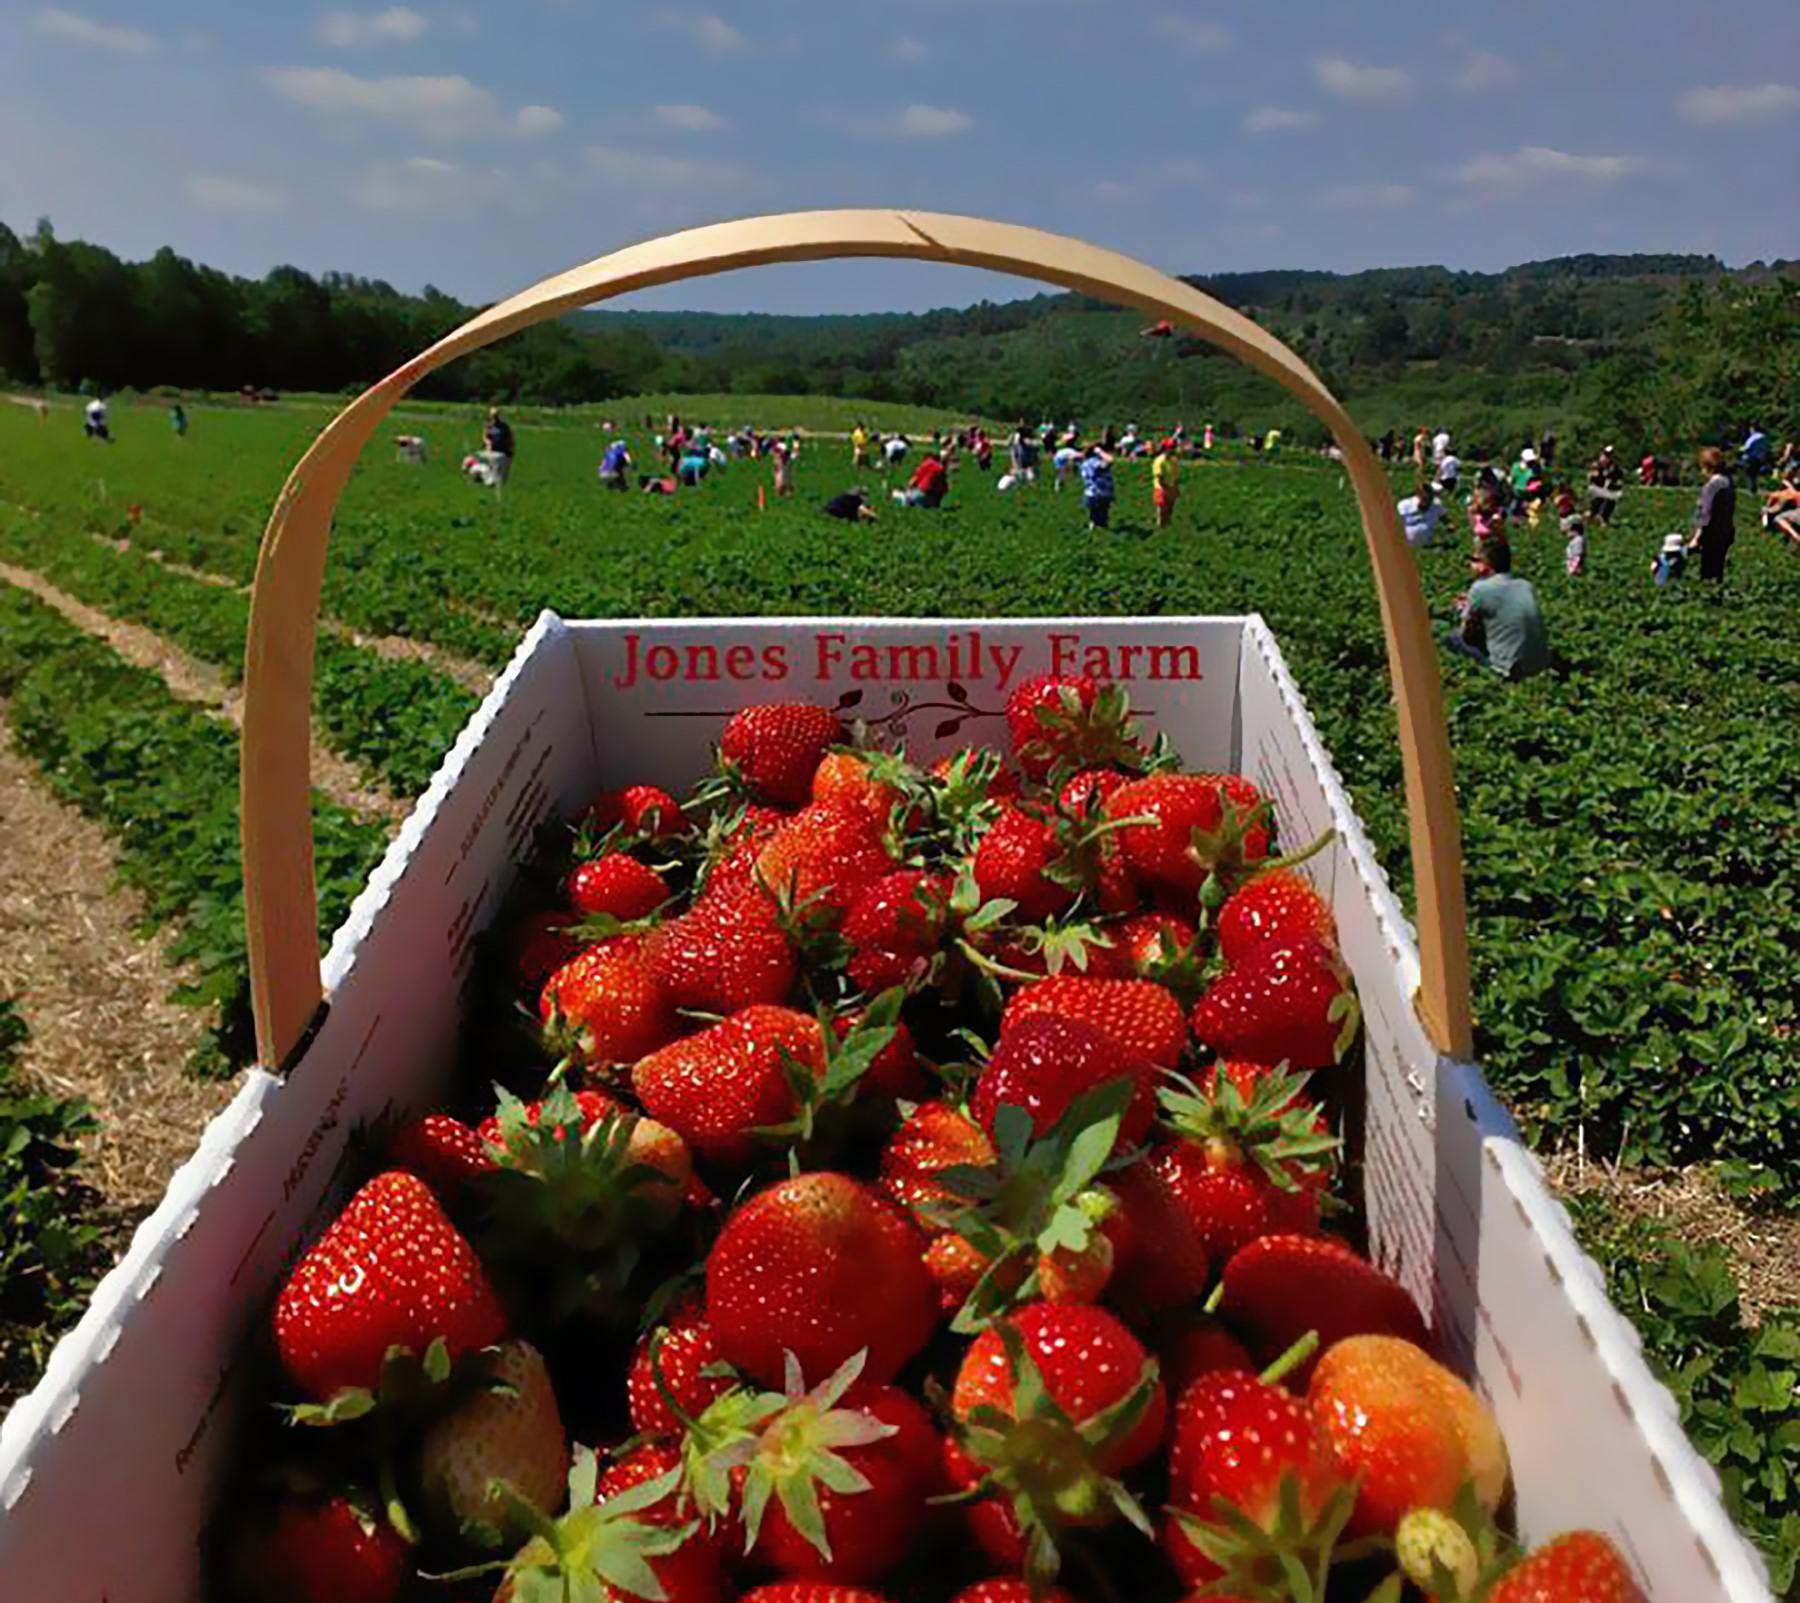 Strawberry picking returns to Jones Family Farm